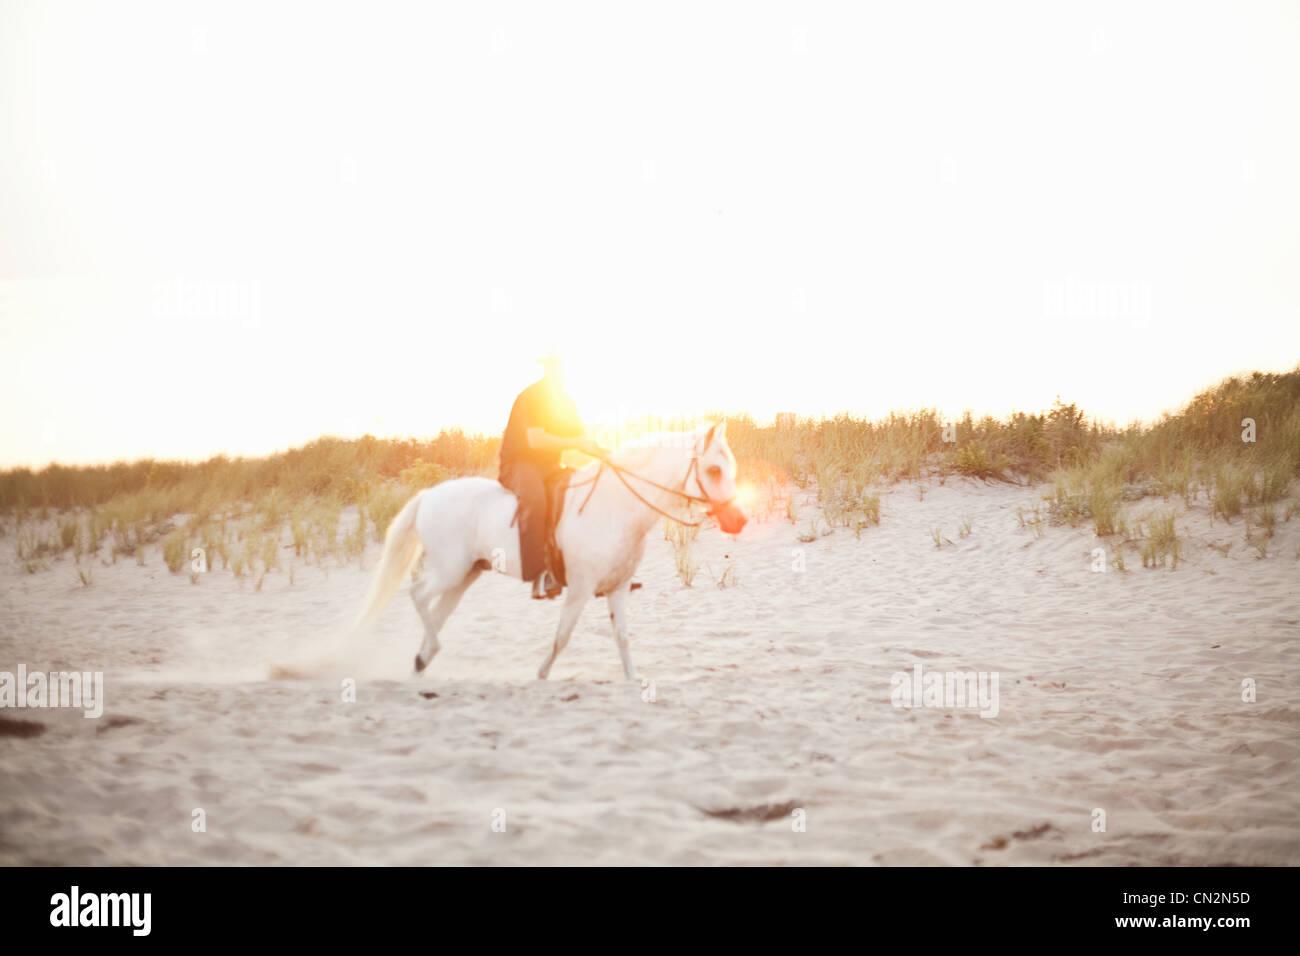 Persona a caballo en la playa Foto de stock